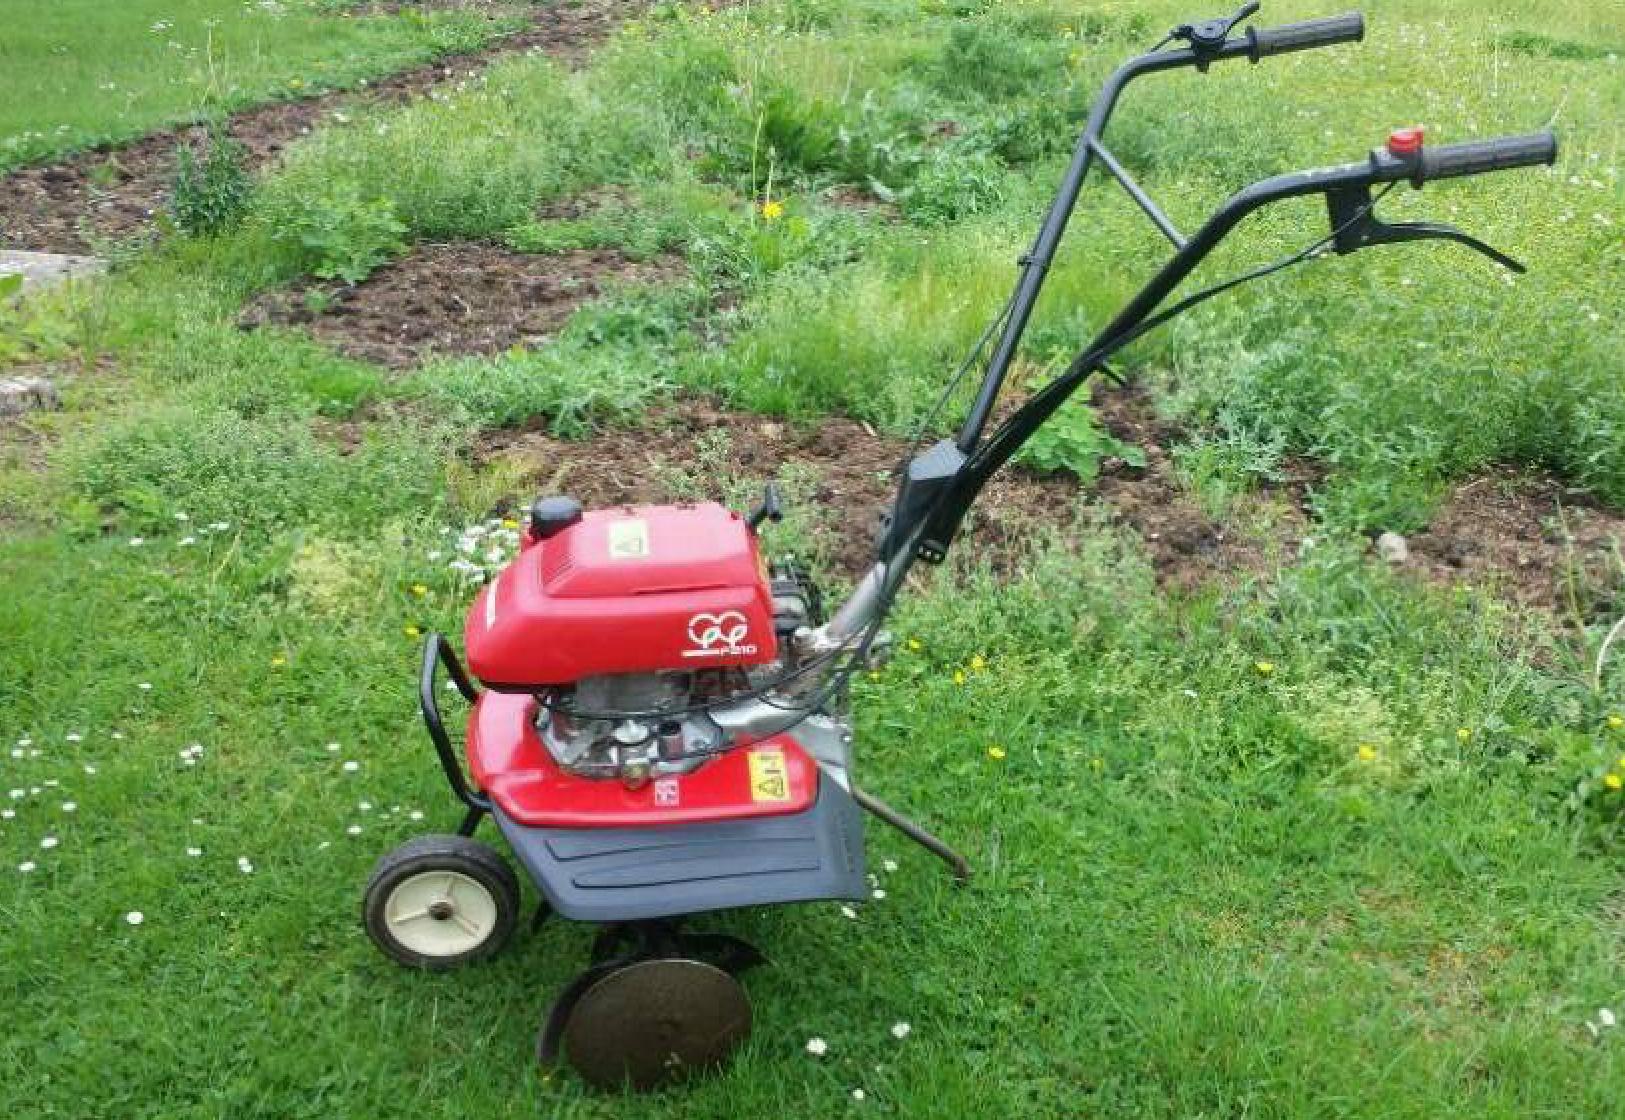 Gartenfräse - Motorhacke